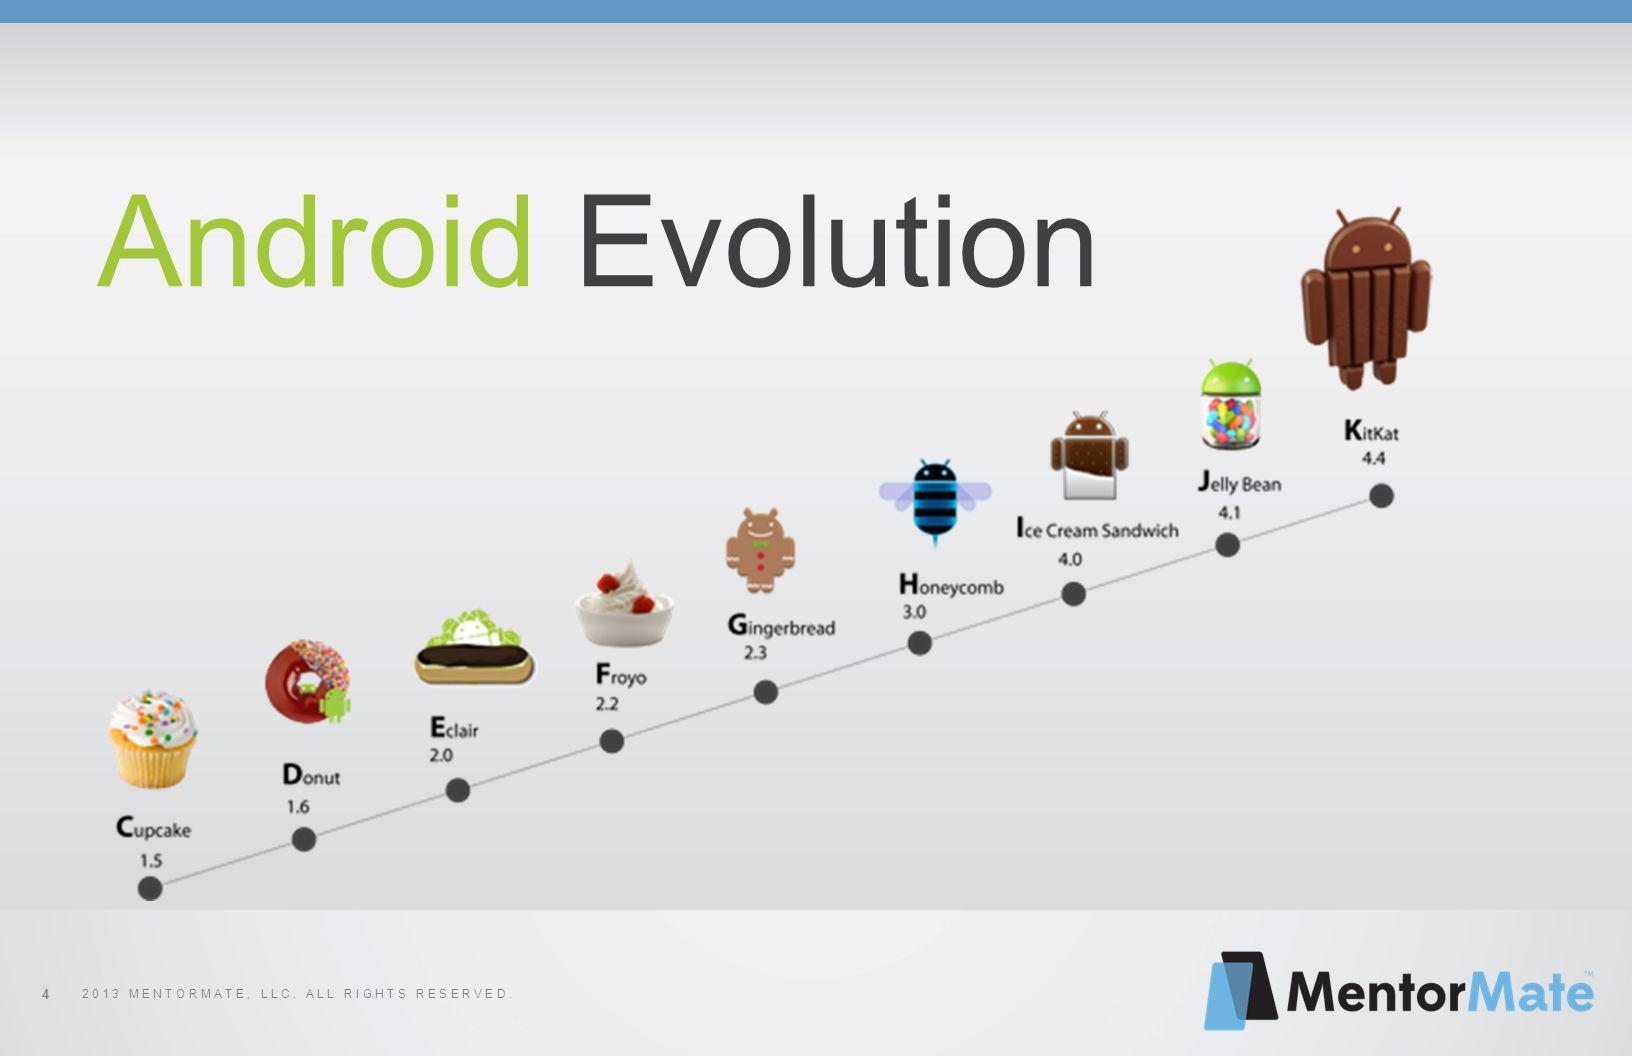 2 0 1 3 M E N T O R M A T E, L L C. A L L R I G H T S R E S E R V E D. 4 Android Evolution